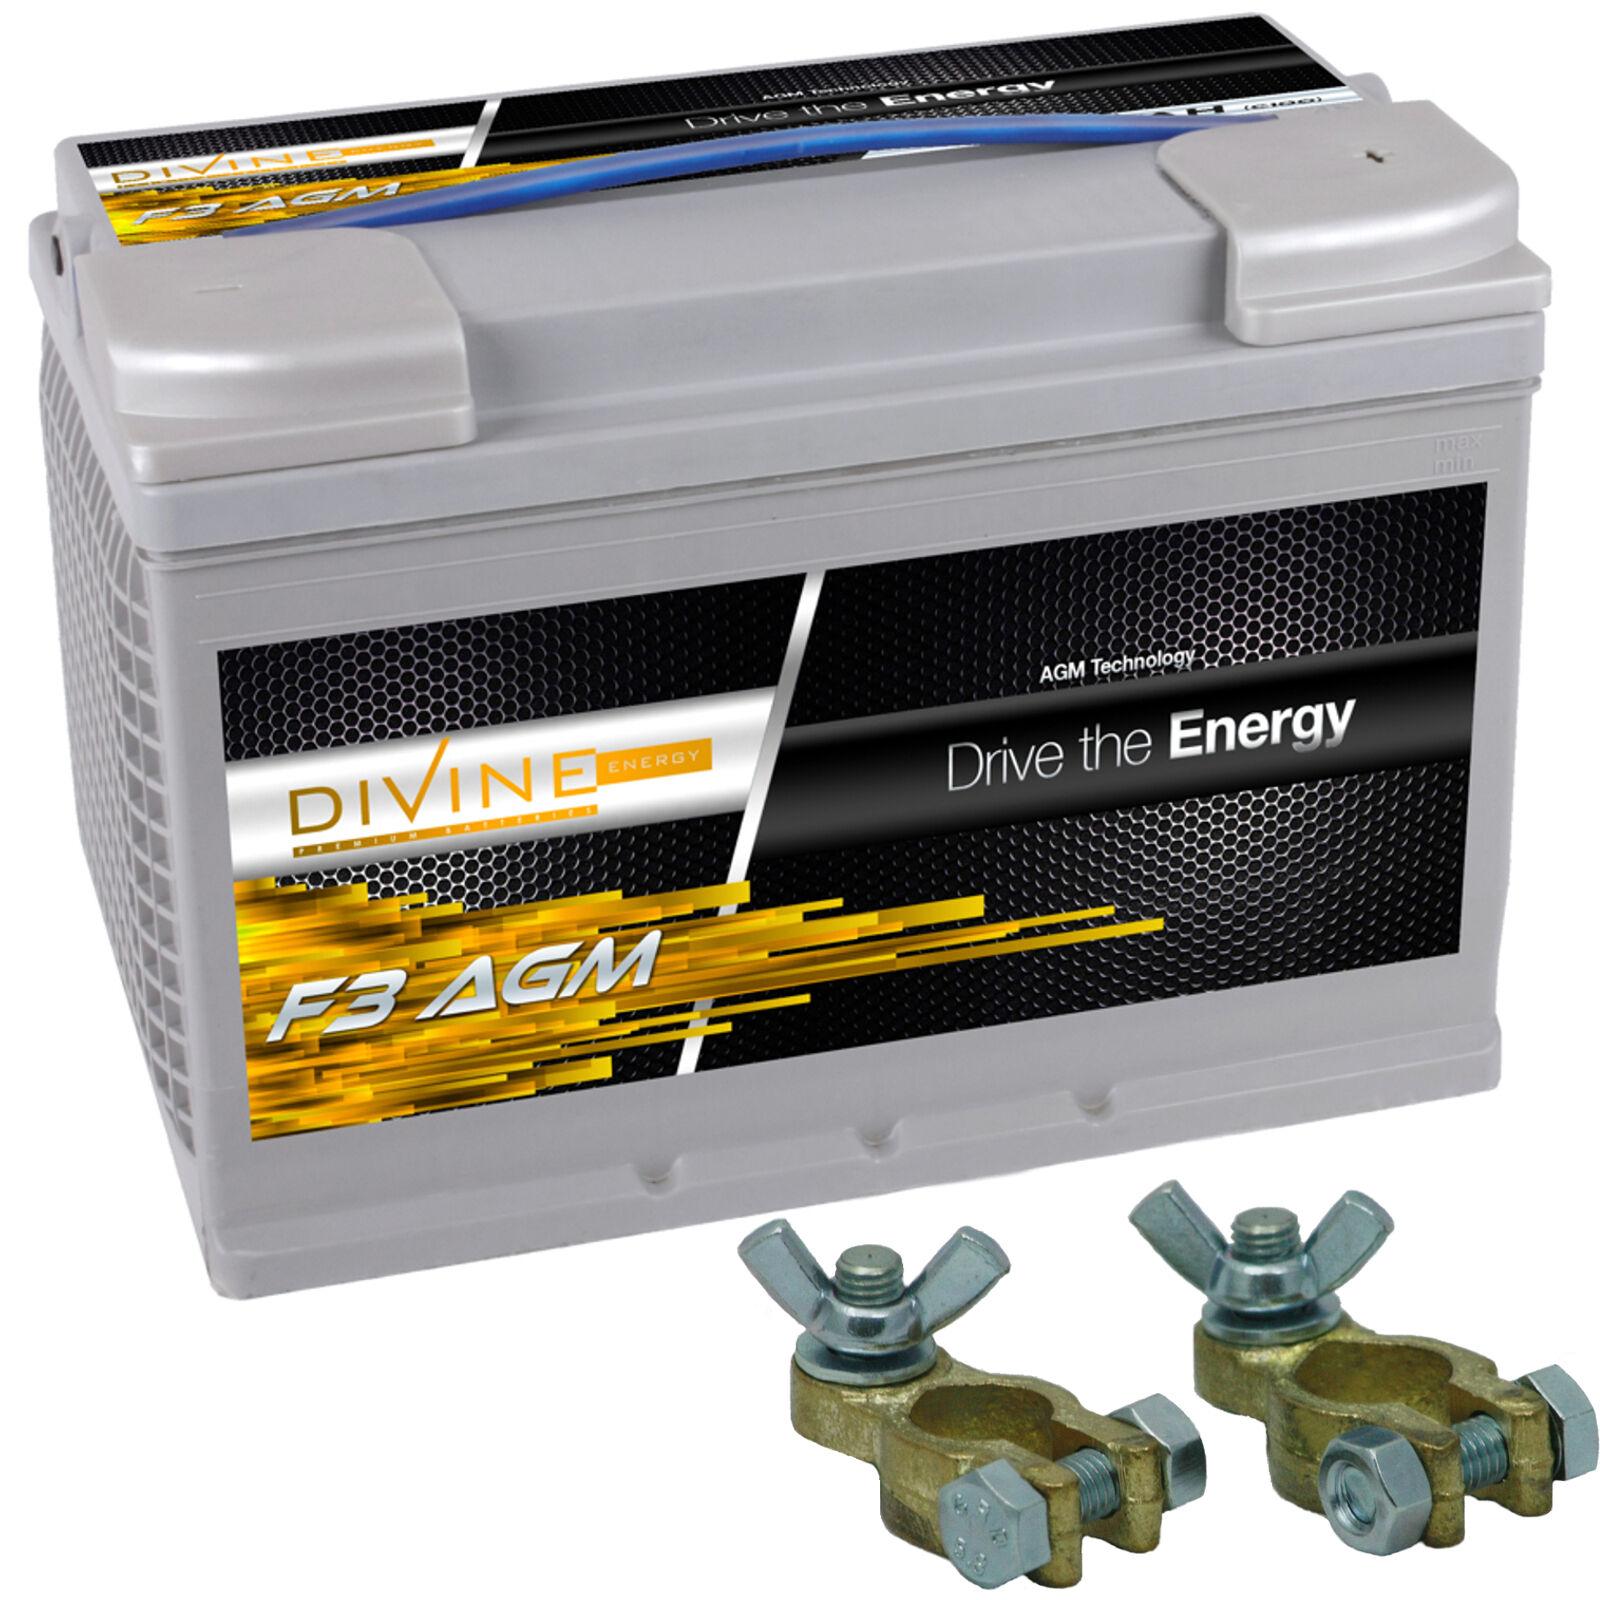 Divine F3 75Ah AGM Batterie Versorgung Stiefel Versorgung Batterie Batterie mit Batterieklemmen 15d174